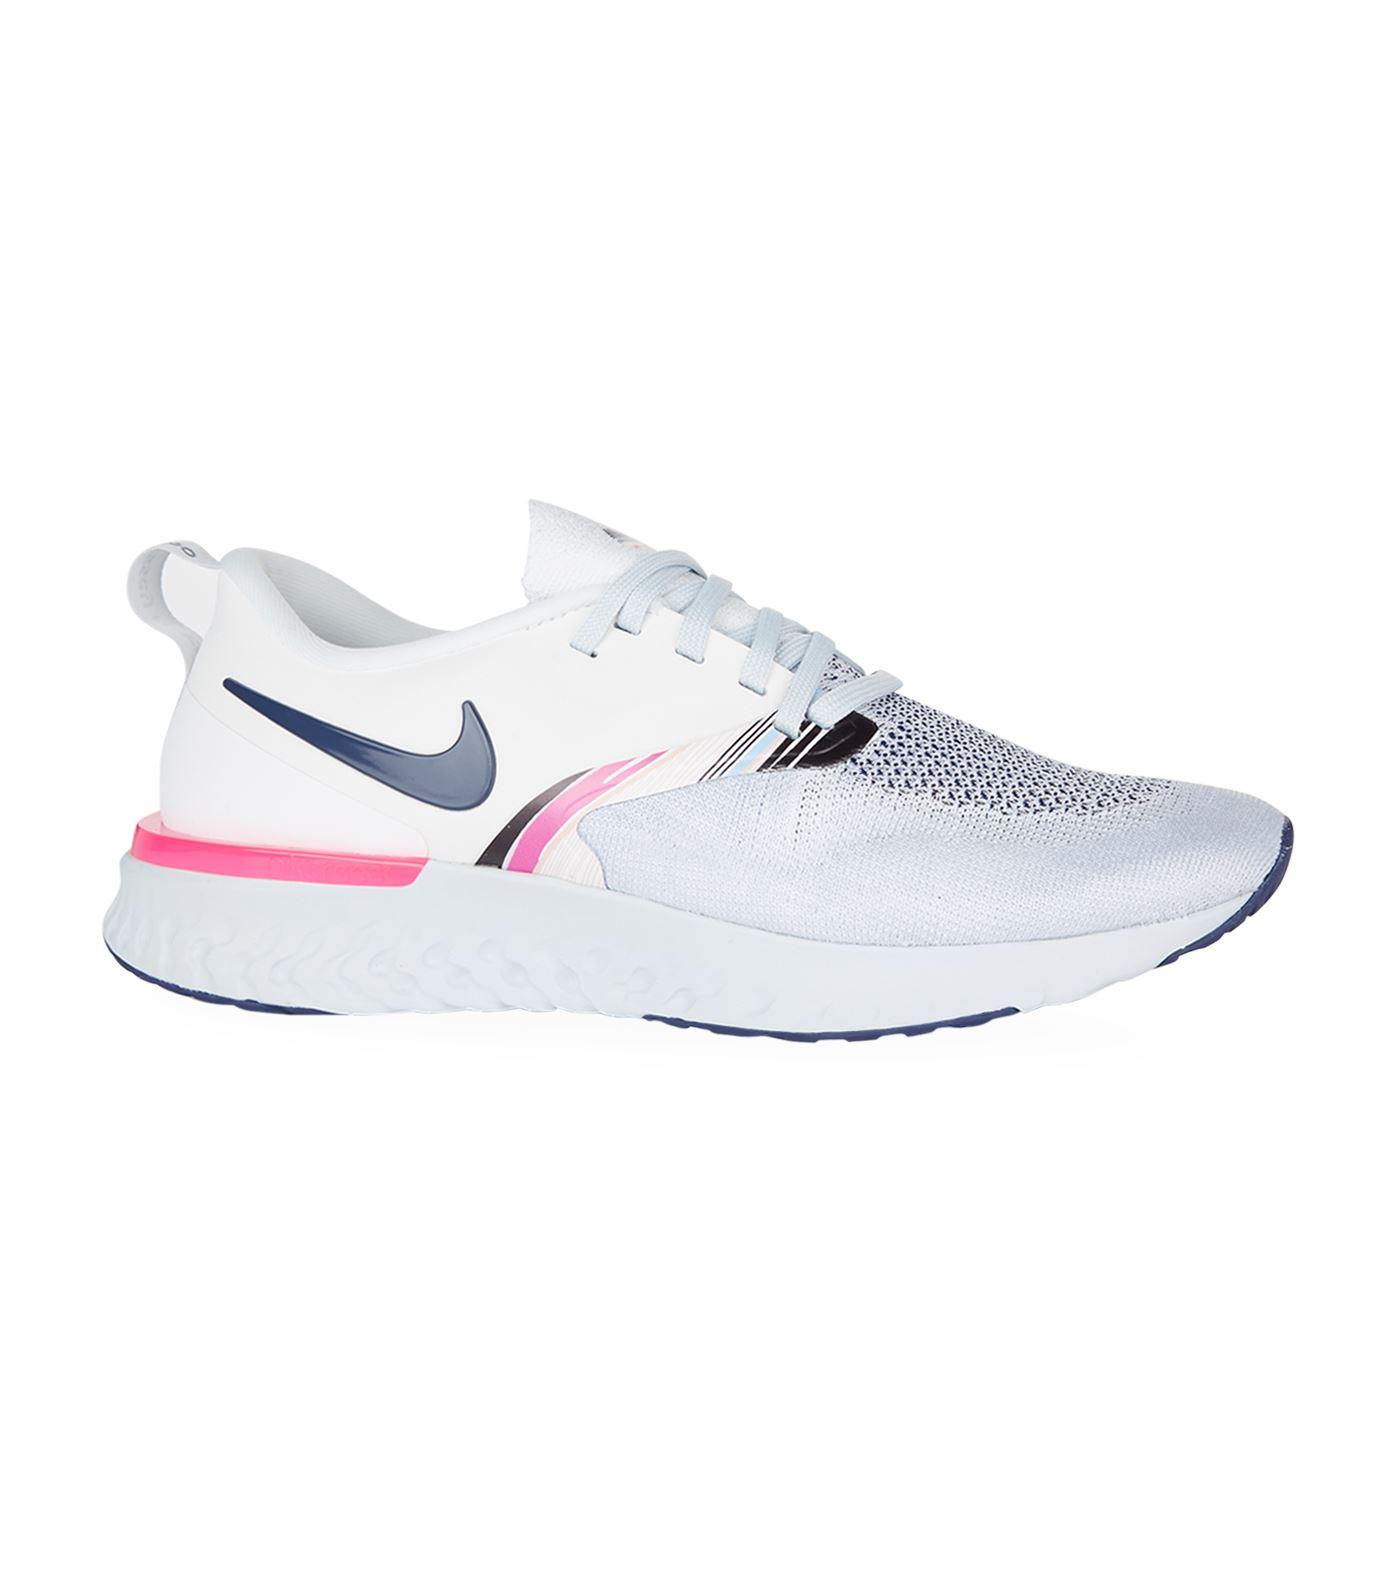 f7800e4ec0646 Nike Odyssey React 2 Flyknit Trainers in White - Lyst